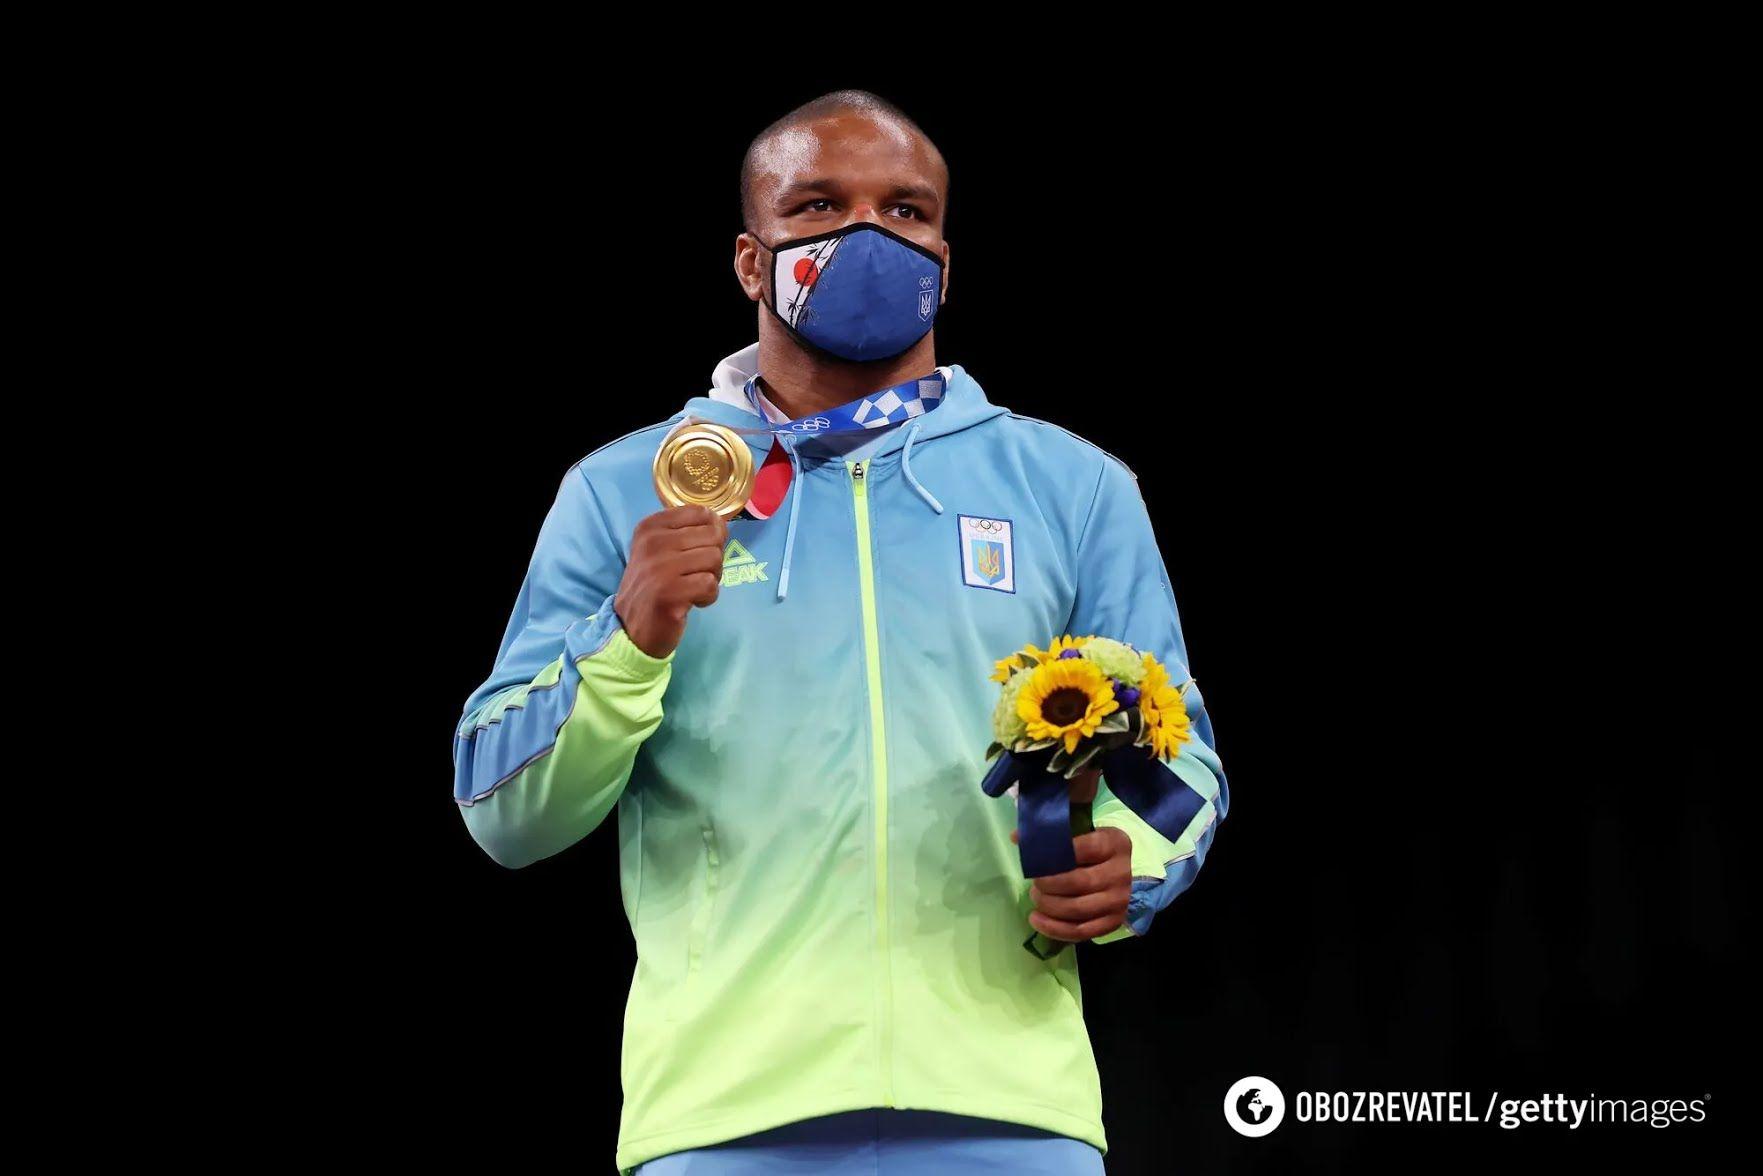 Жан Беленюк стал медалистом Токио-2020.